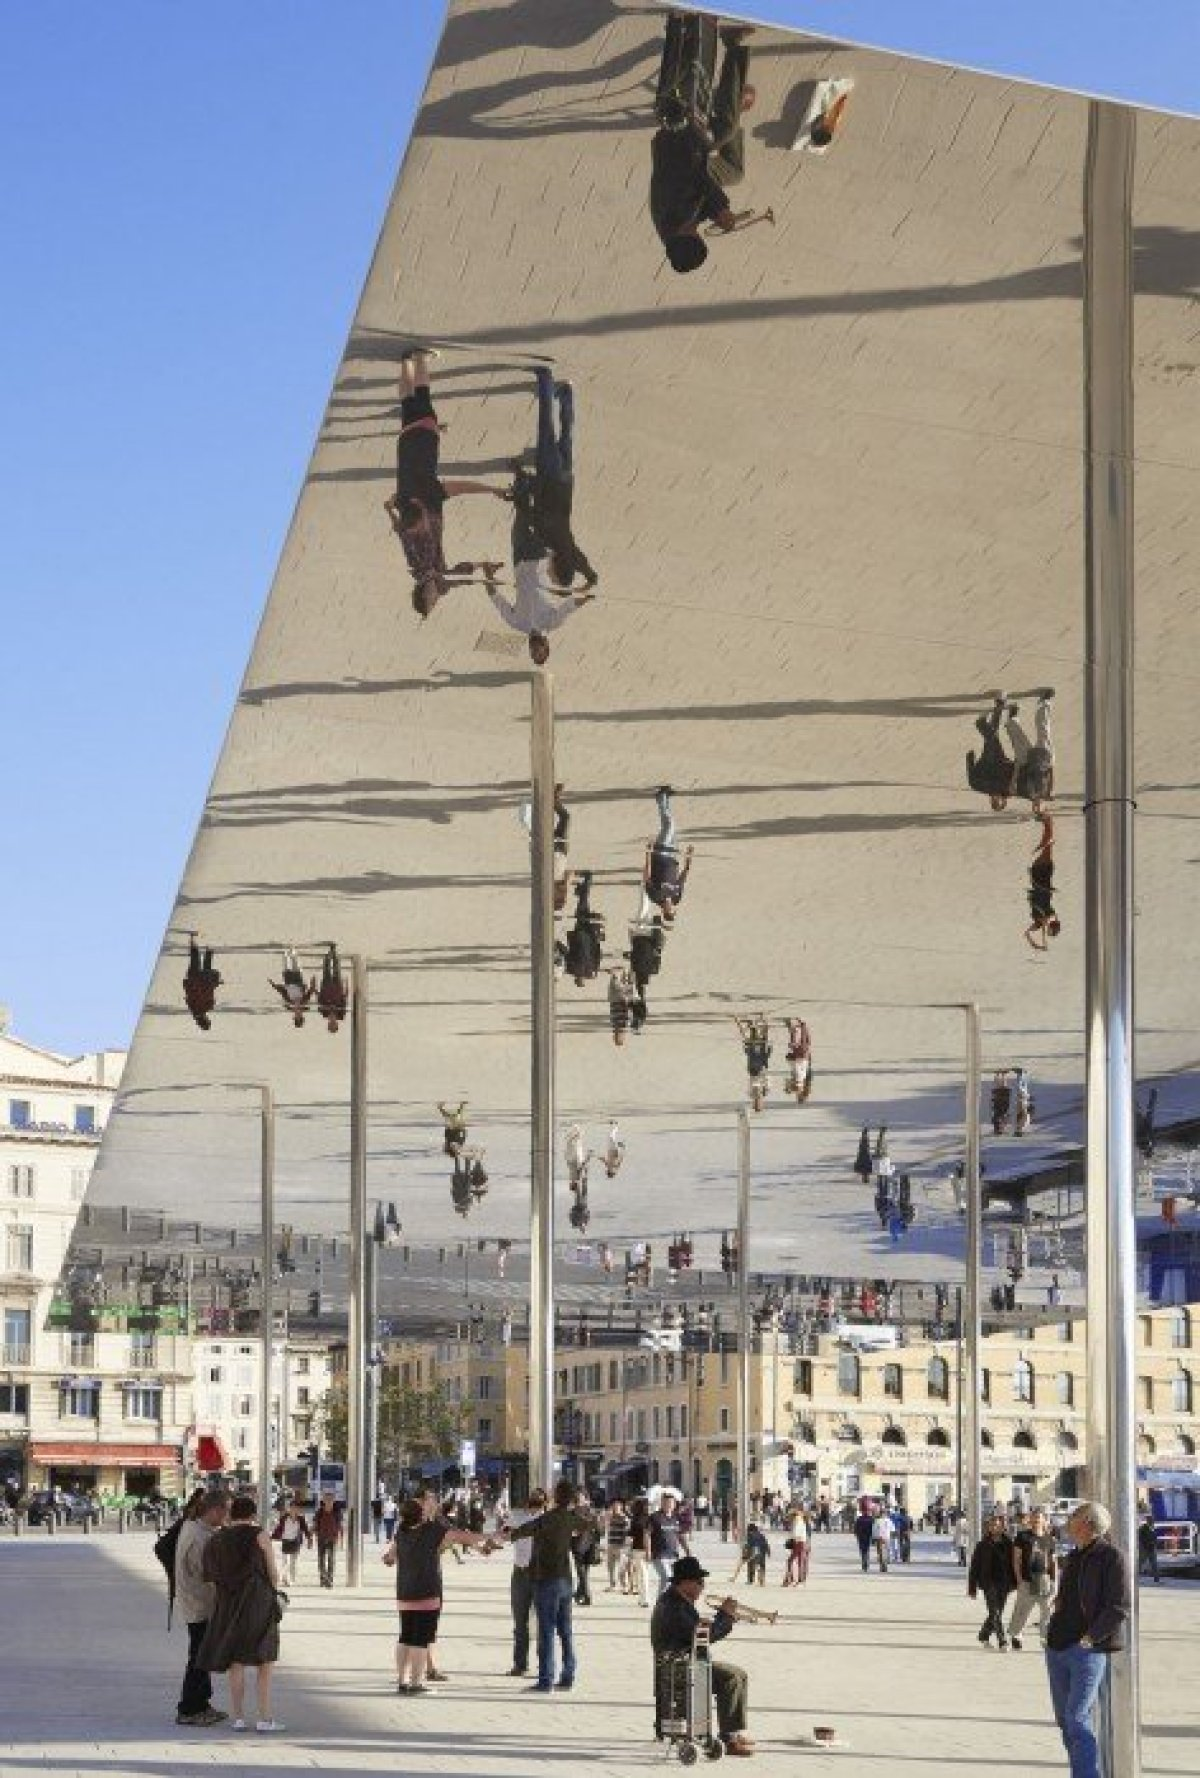 7d10b0c87a270b42cada97fb6036c193 1 กระจกเงาที่สะท้อนพื้นที่บริเวณและผู้ที่มายืน ภายใต้ซุ้ม Vieux Port Pavilion